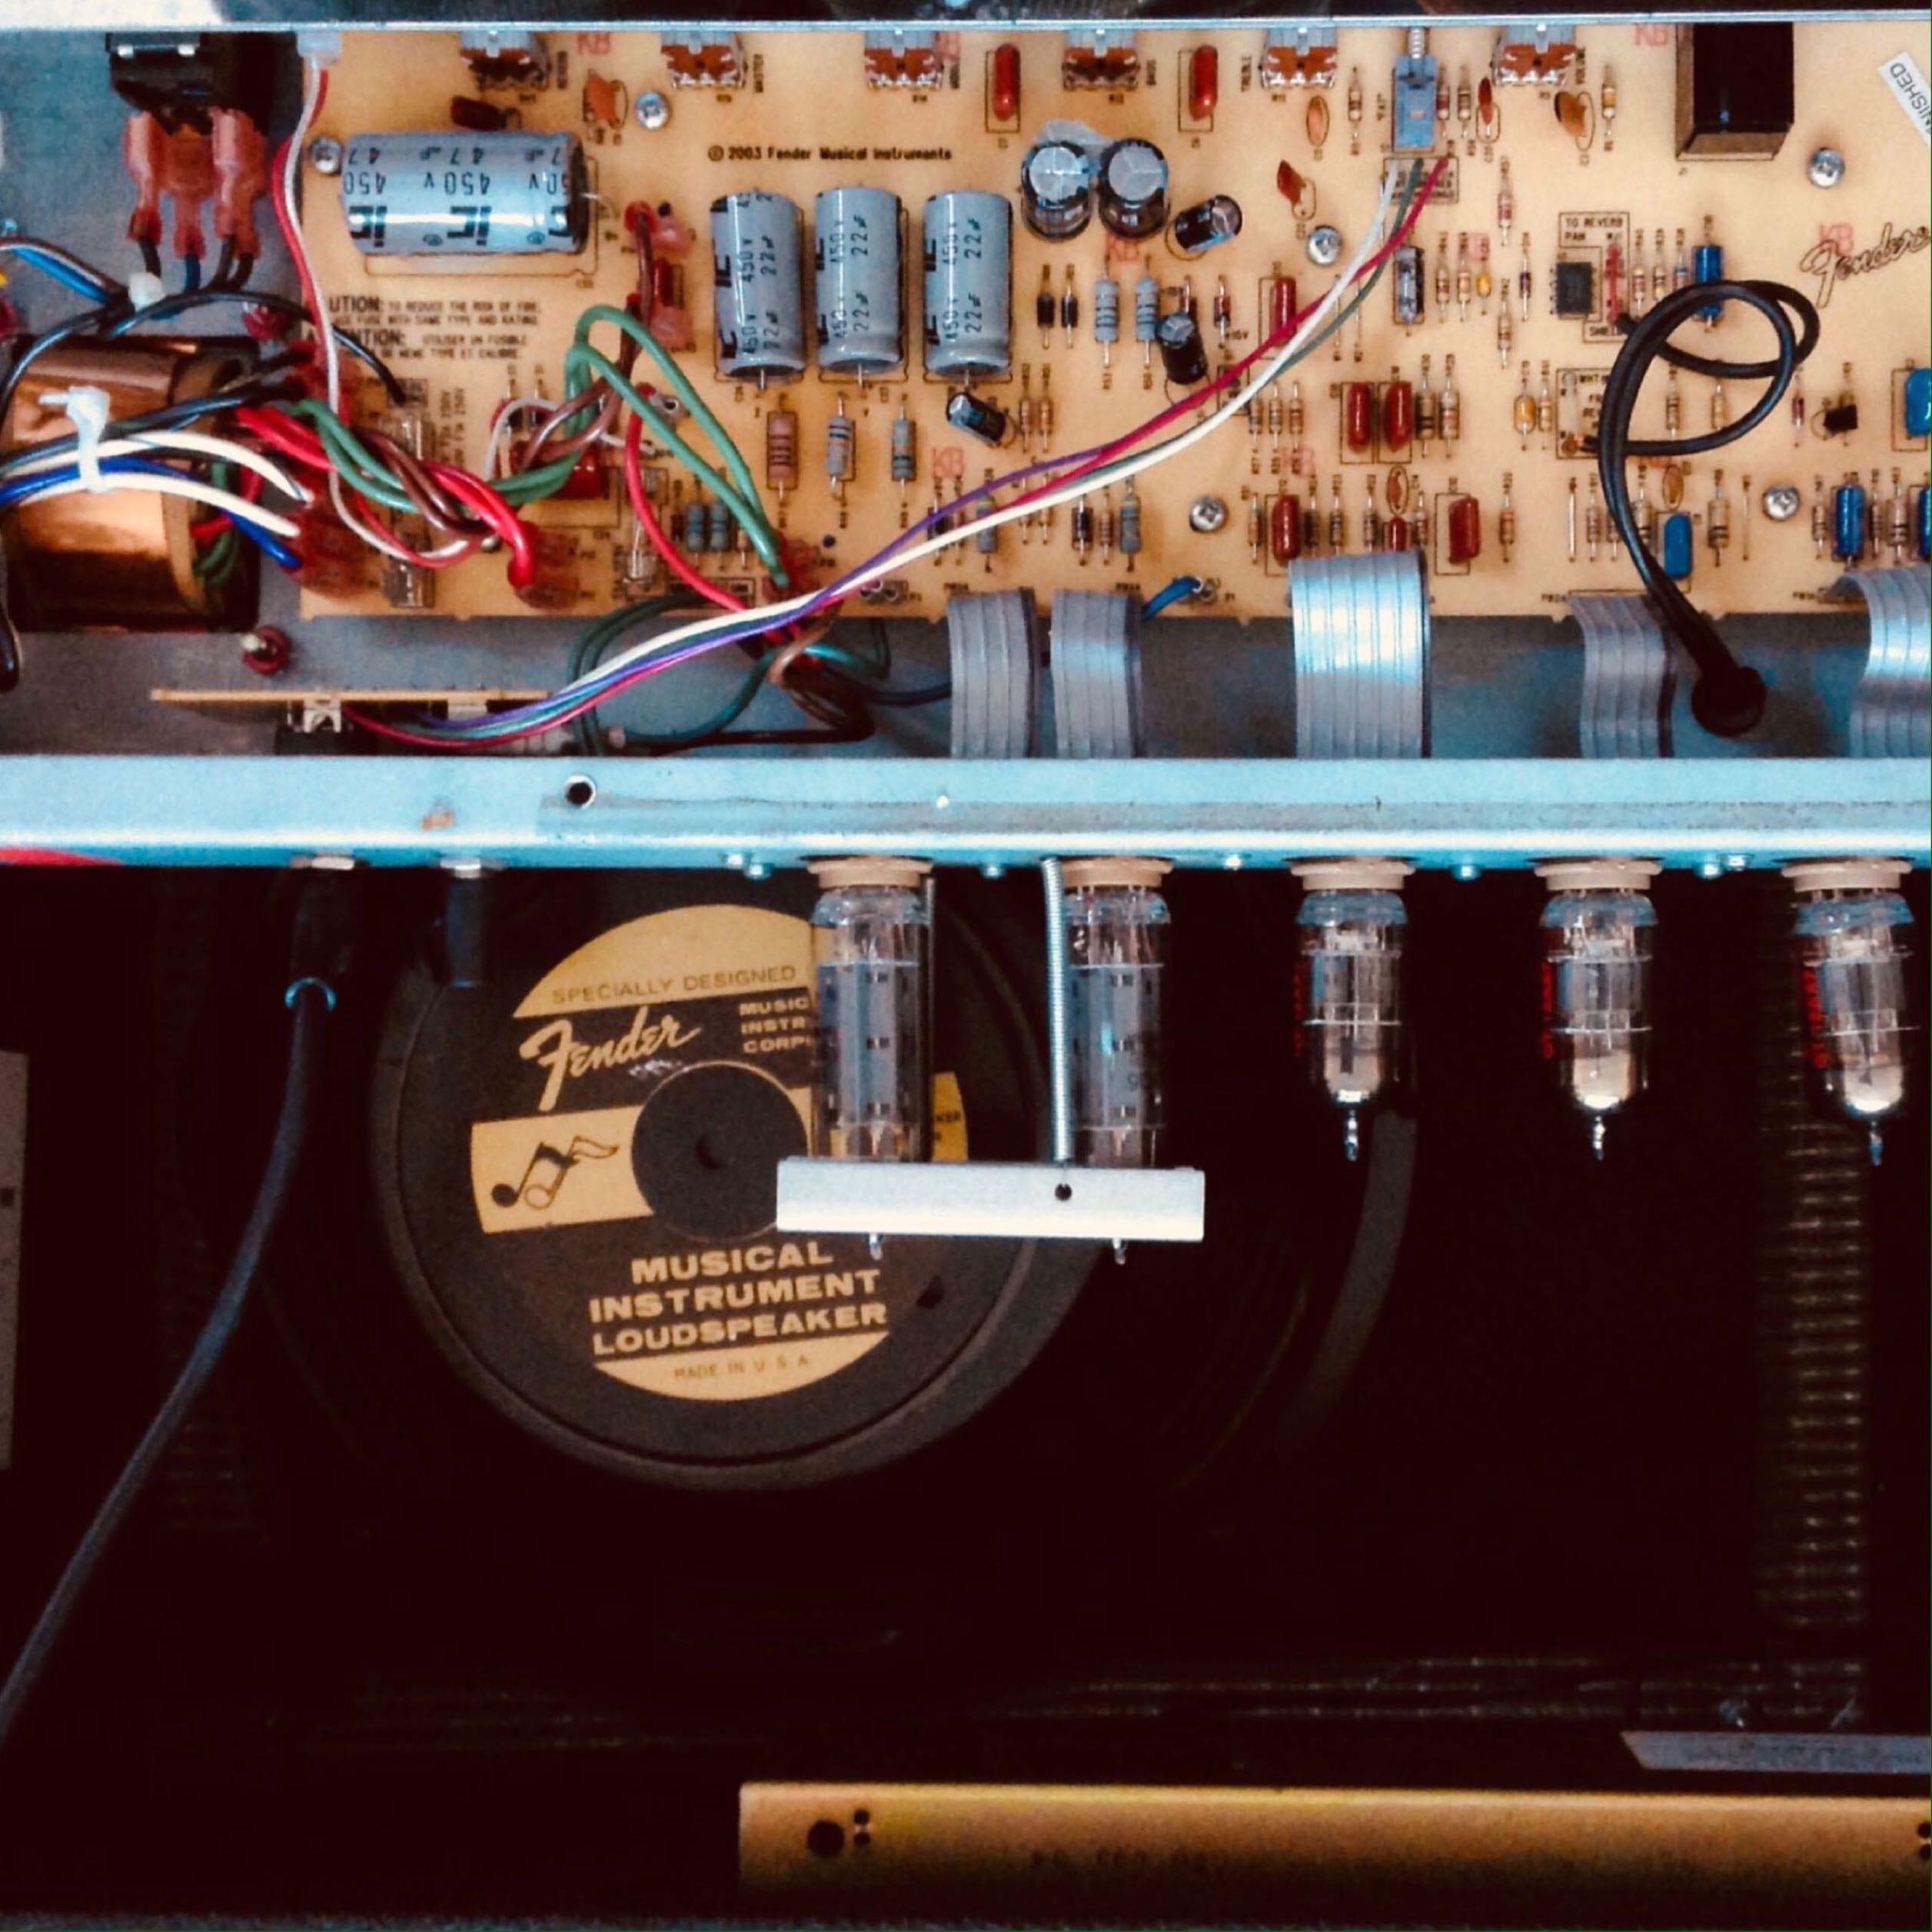 Fender Blues Jr Inside view image